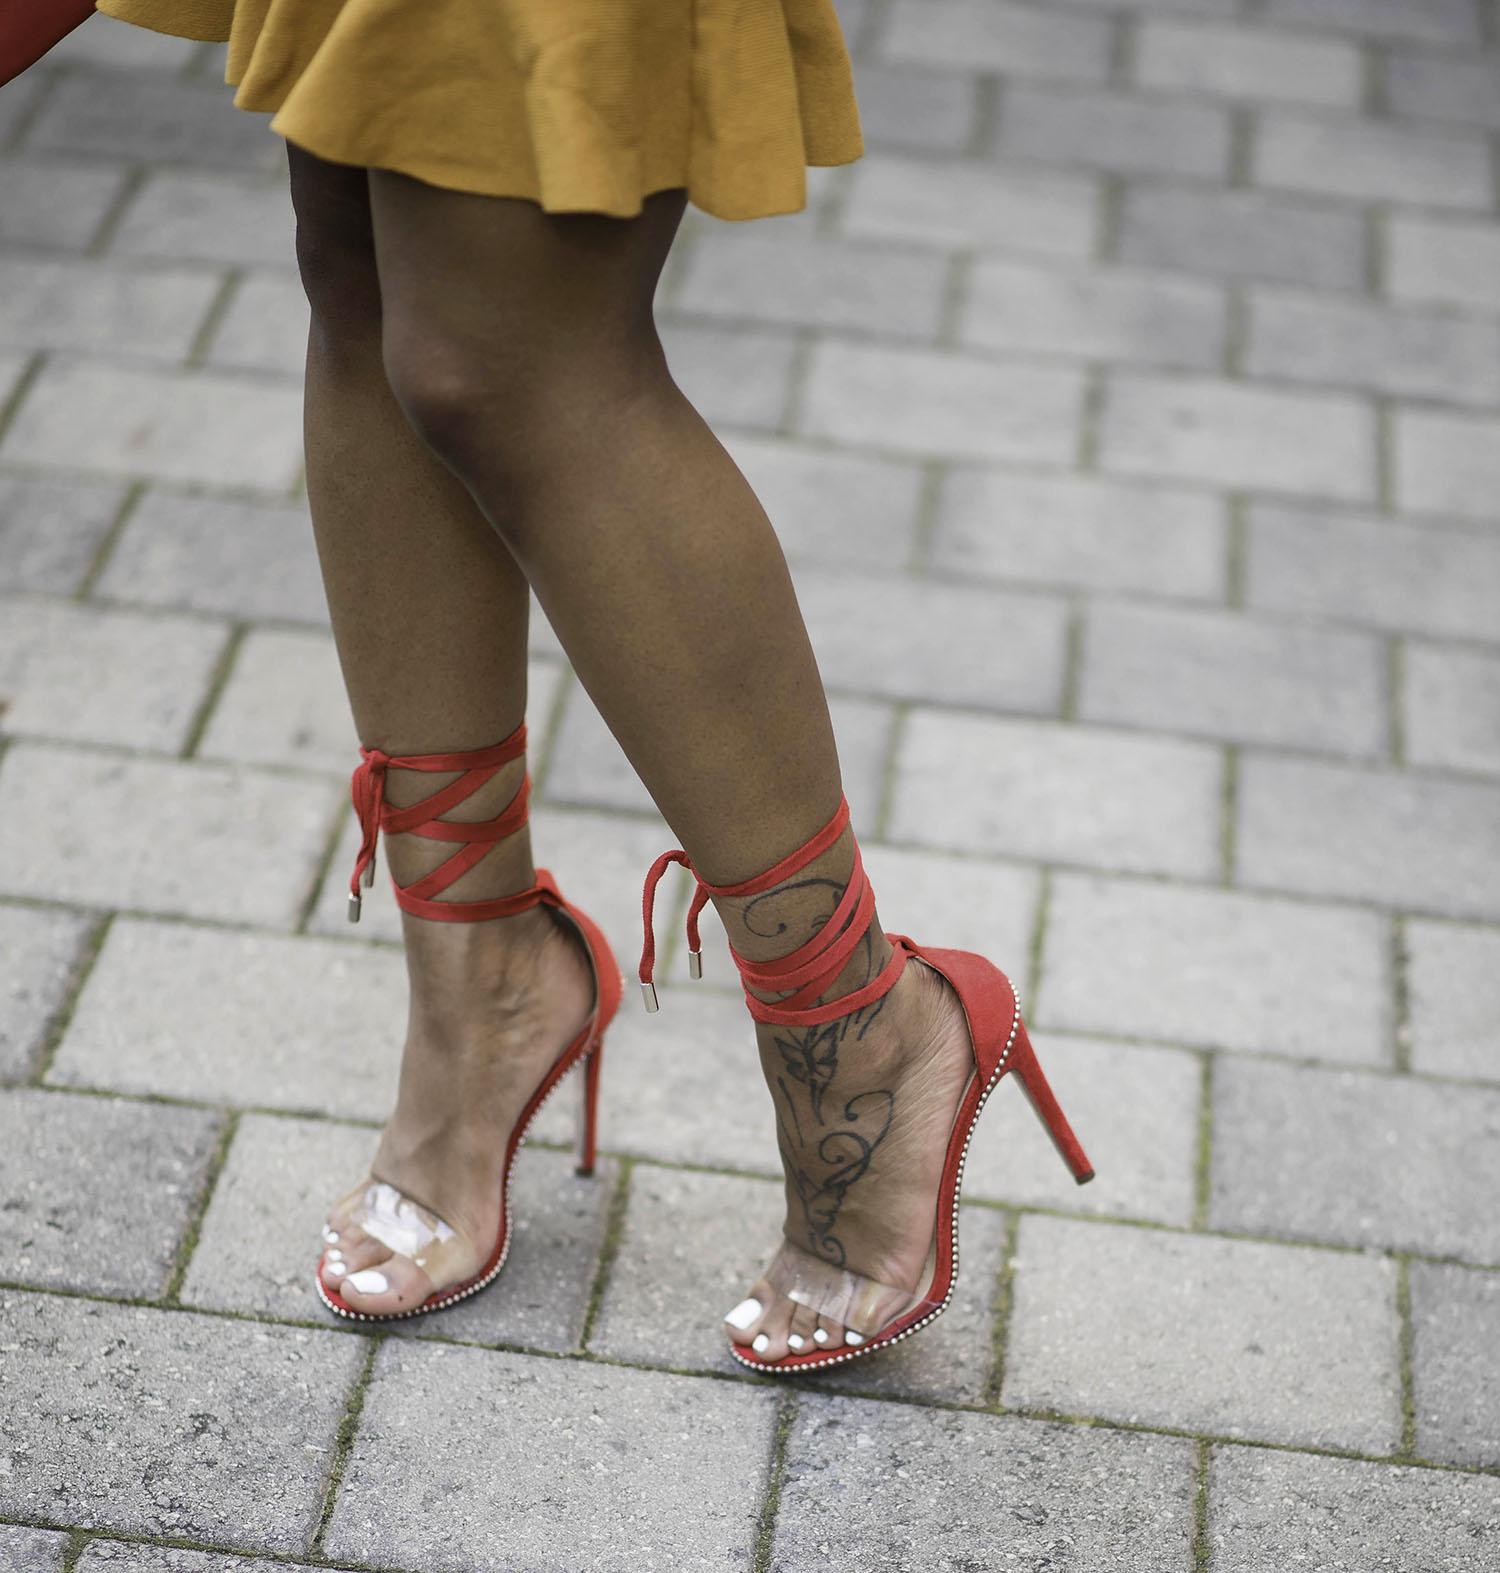 710a536df4b Hot Stuff - Red Tie-Up Heels - DoubleOStyles